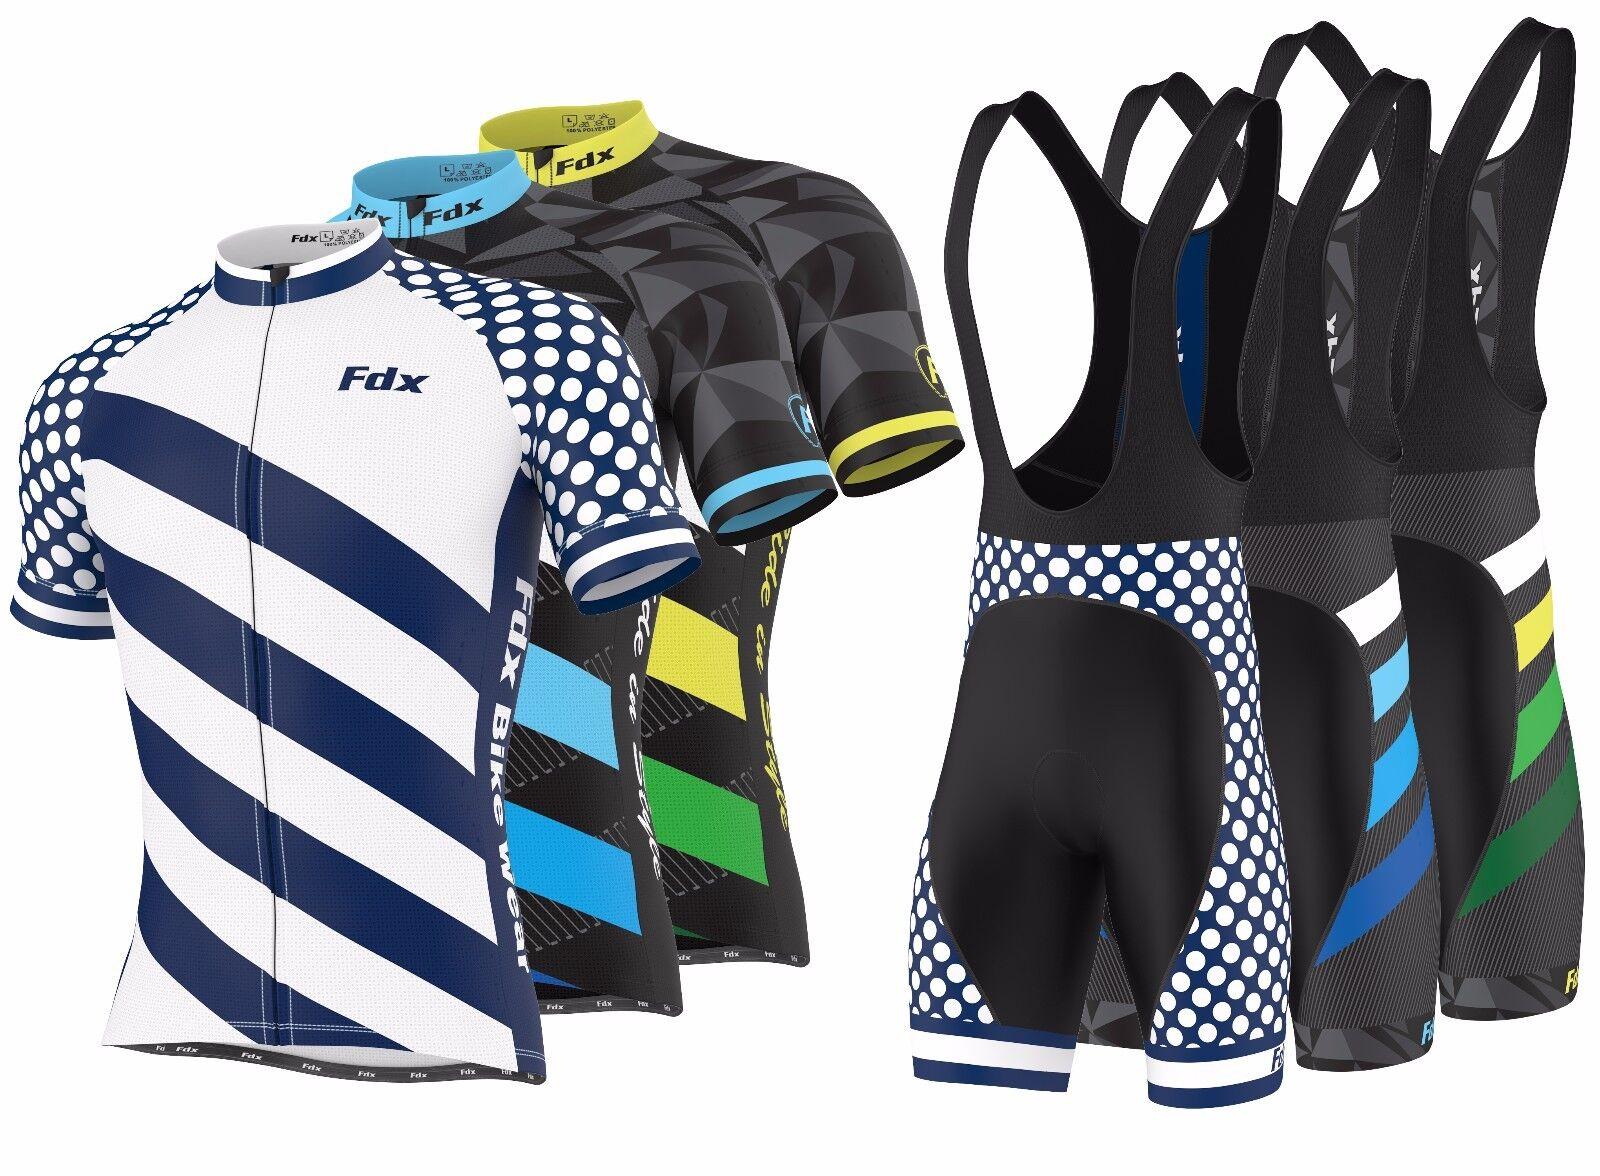 FDX Mens  Limited Edition  Cycling Bib Gel Padded shorts + Cycling Jersey Combo